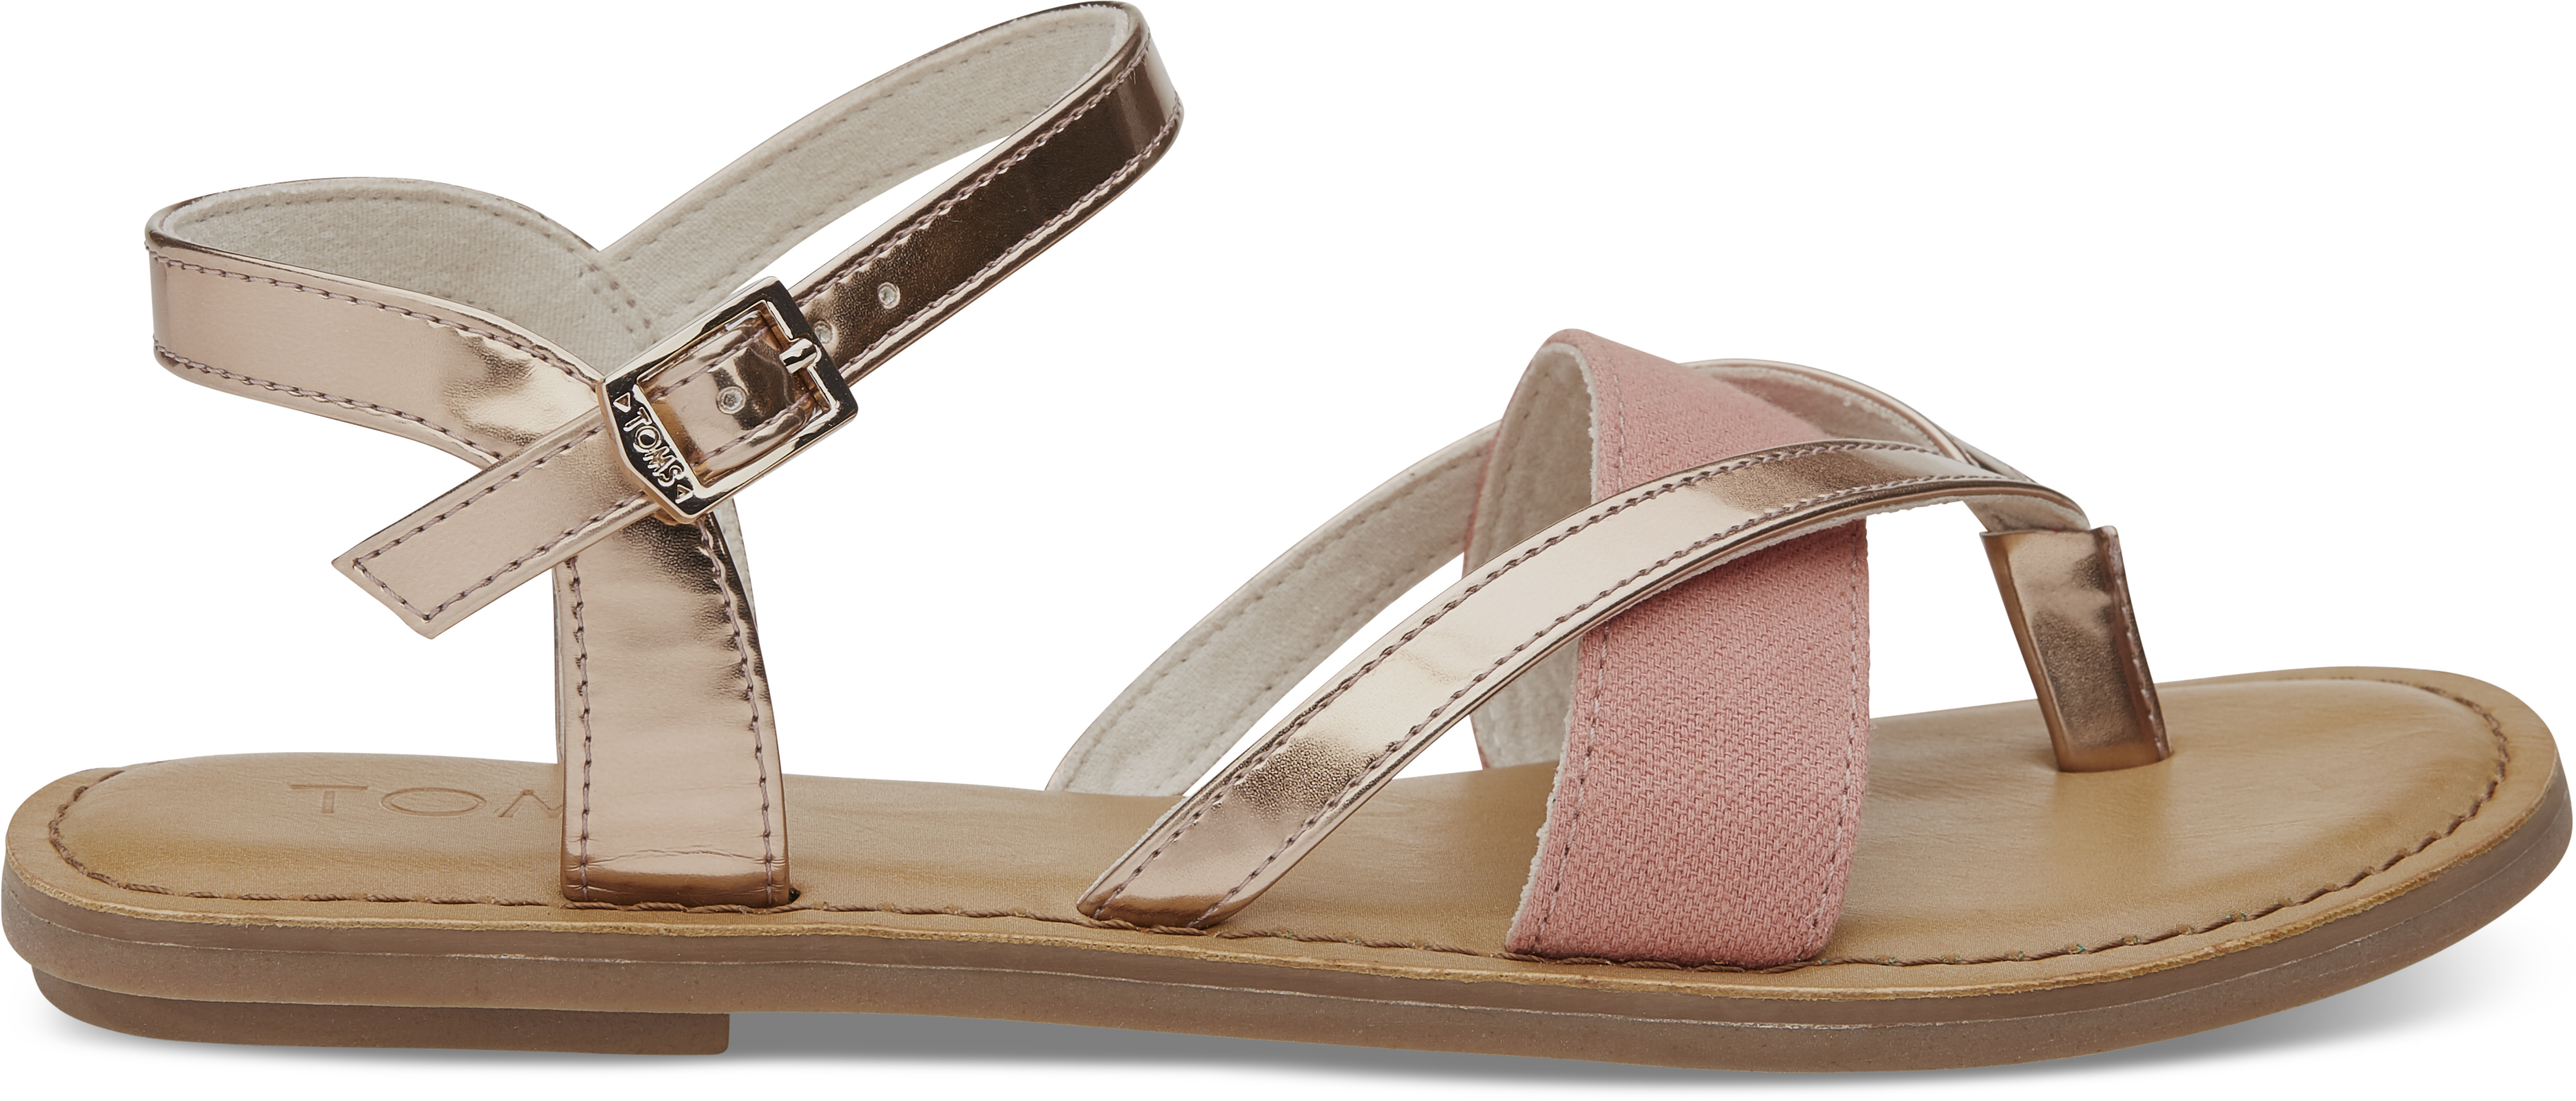 Dámské stříbrné sandálky TOMS Specchio Oxford Lexie 7,5/38